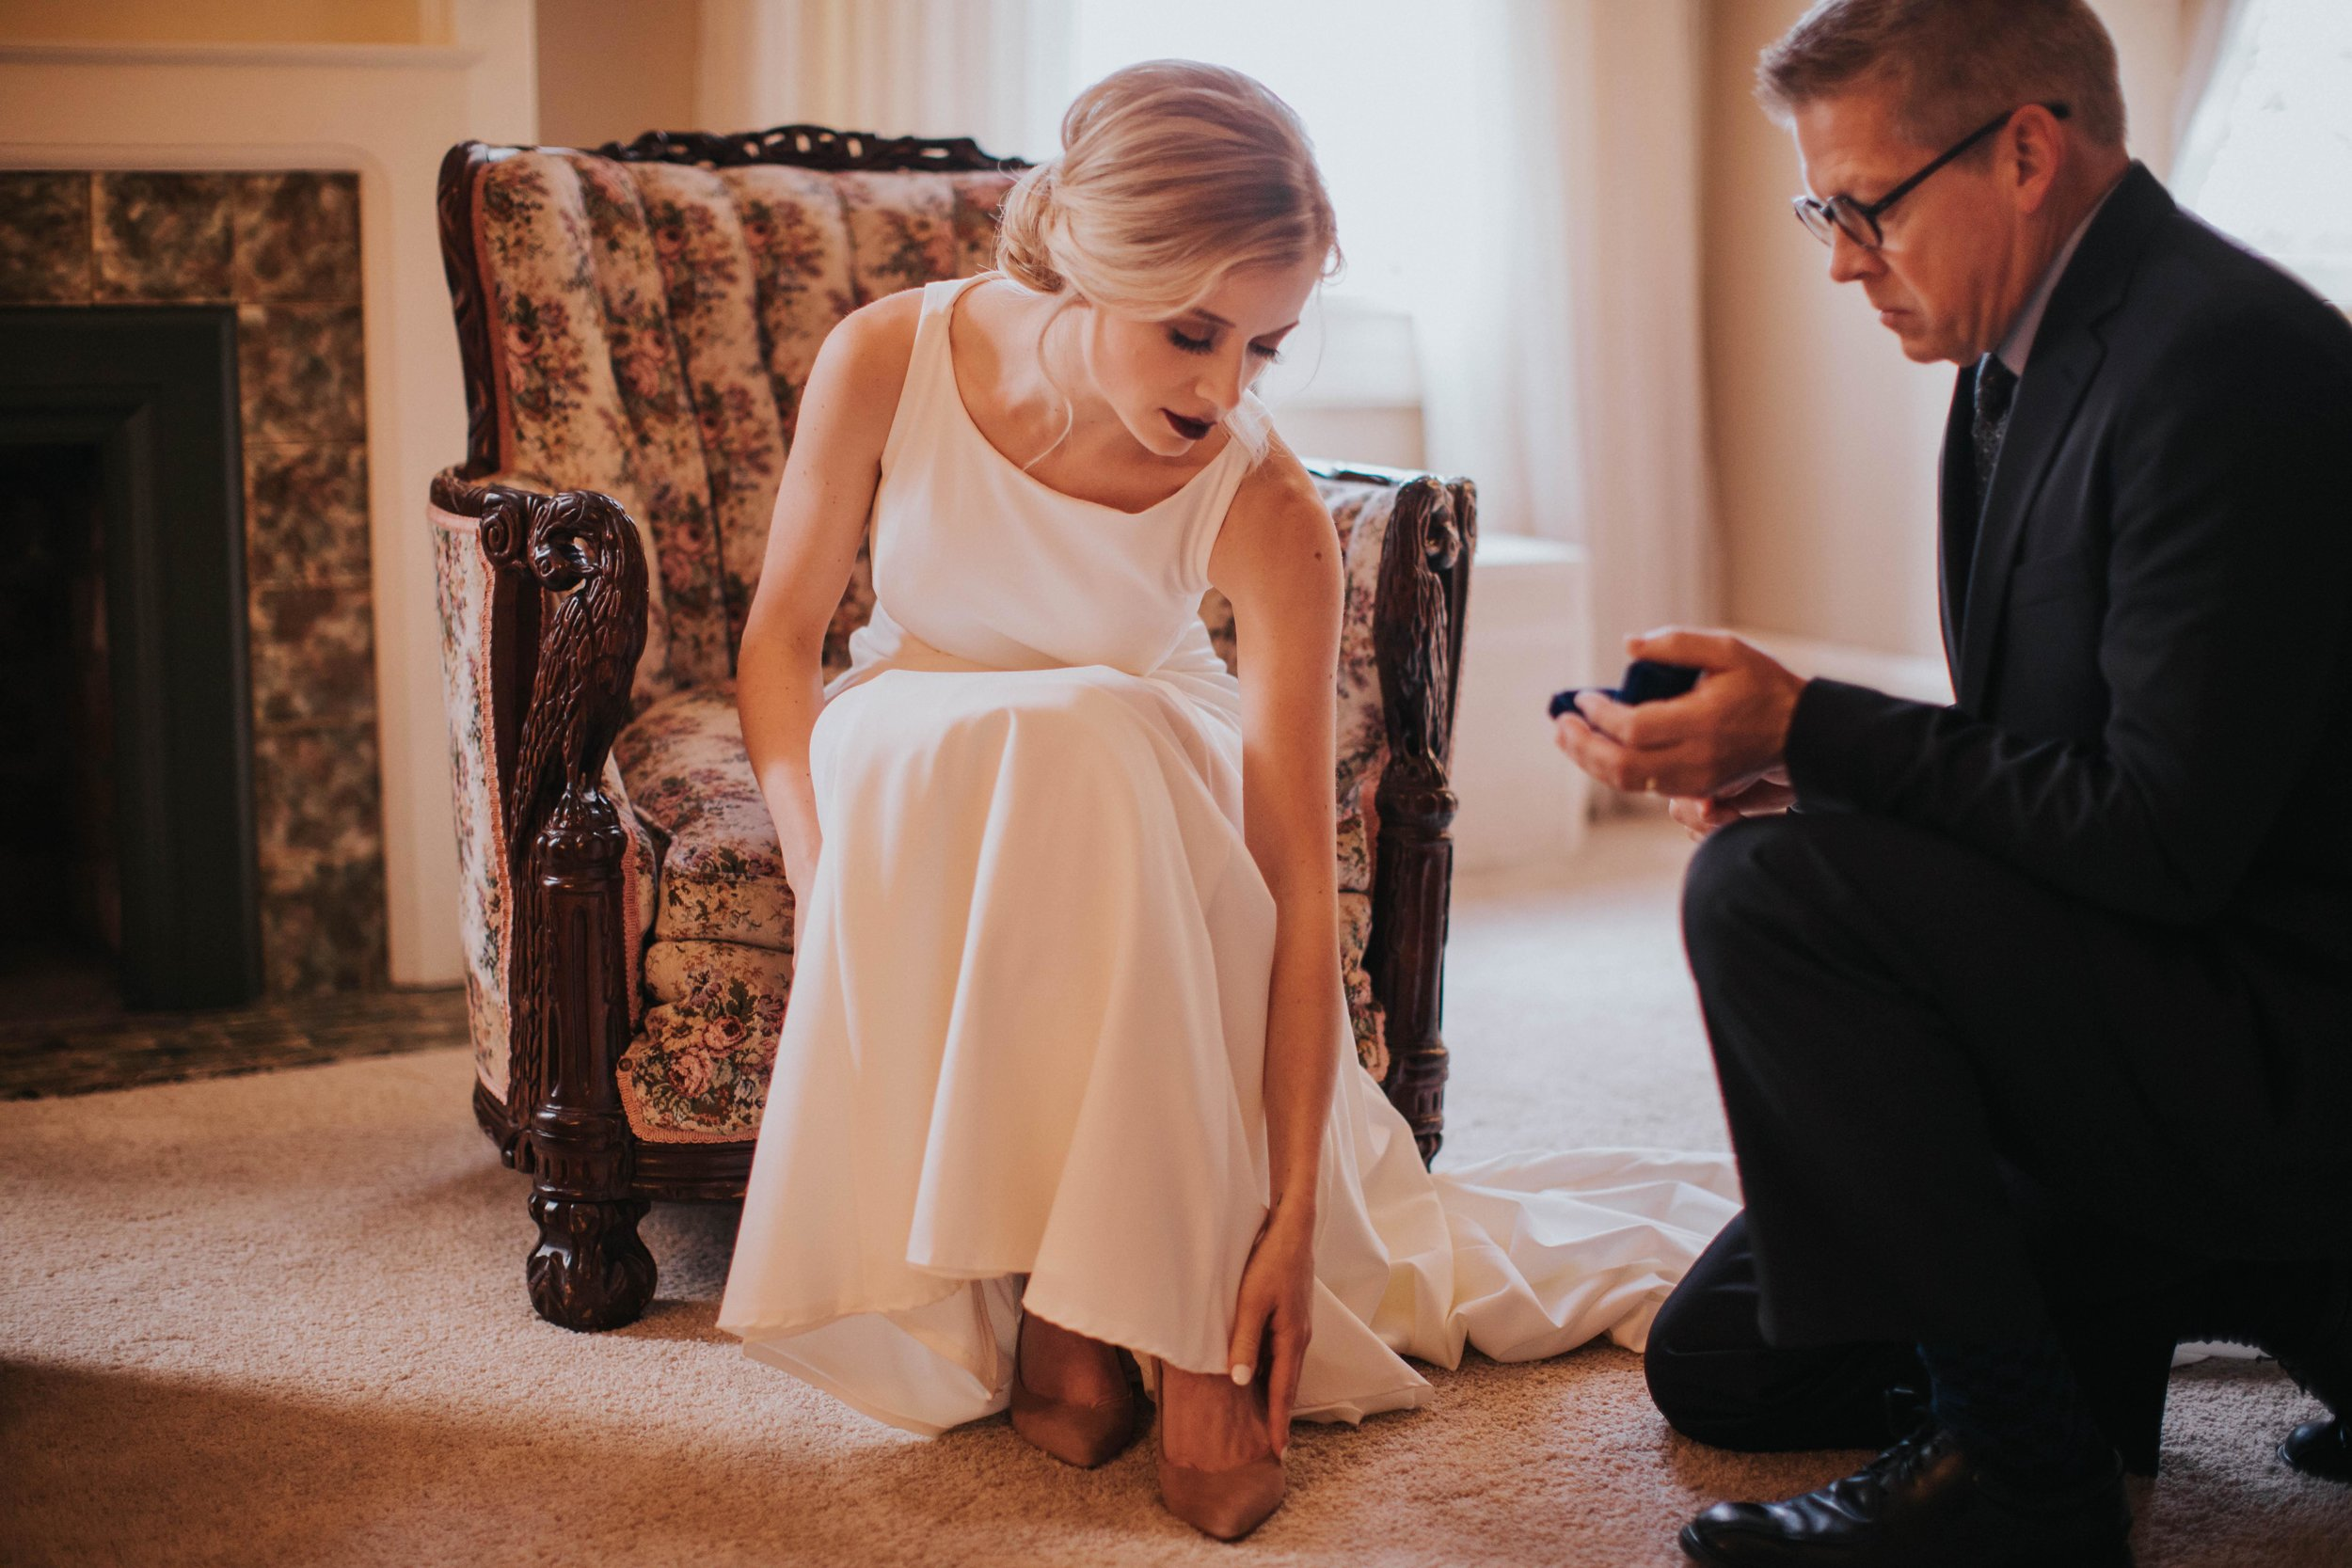 Charis_Lauren_Romantic_Wedding_Photographer_Nashville_03A1359.jpg